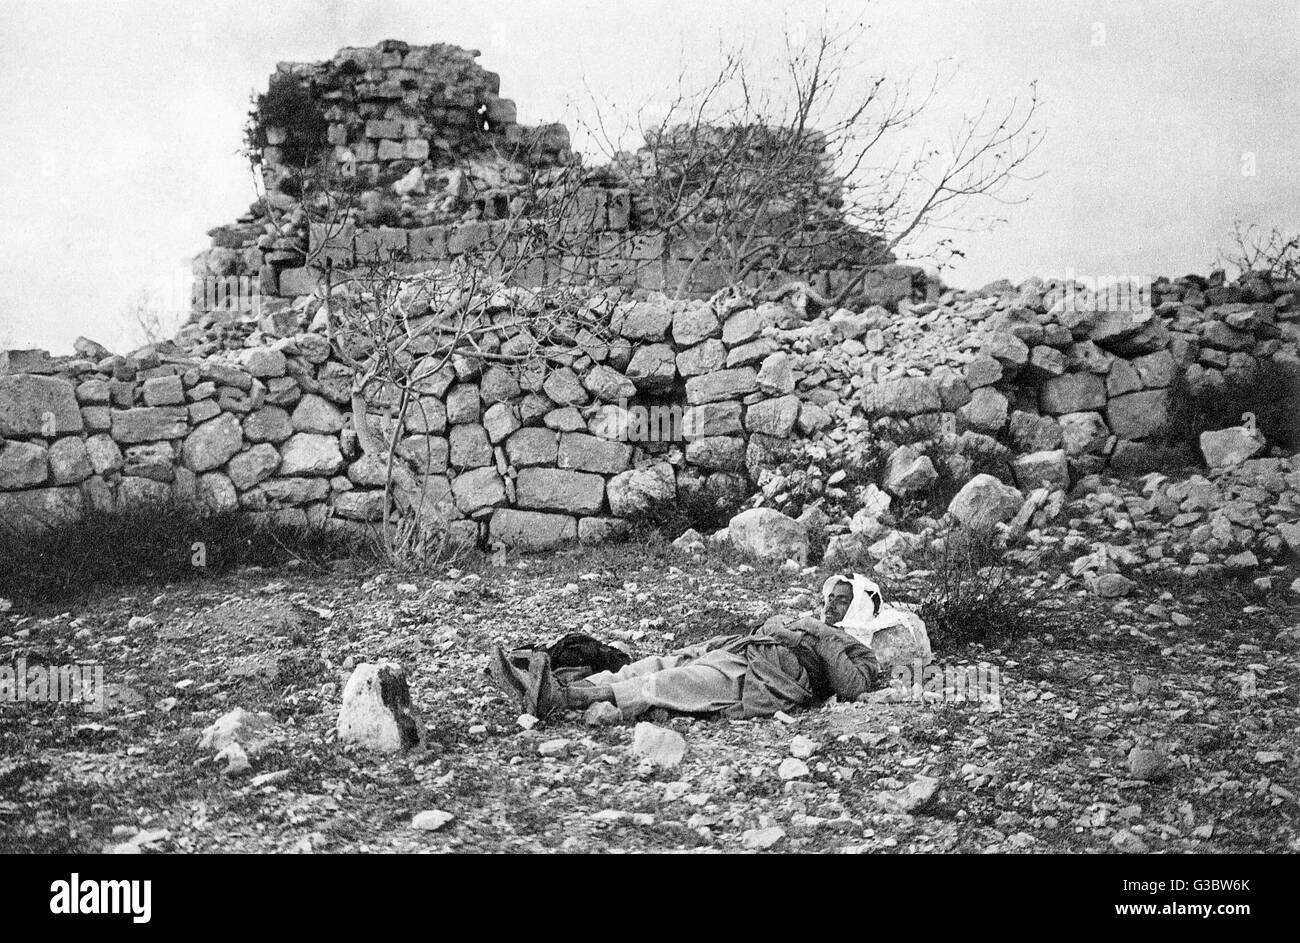 Beitin (identificato come la biblica Bethel), Palestina, West Bank. Data: 1920s Foto Stock